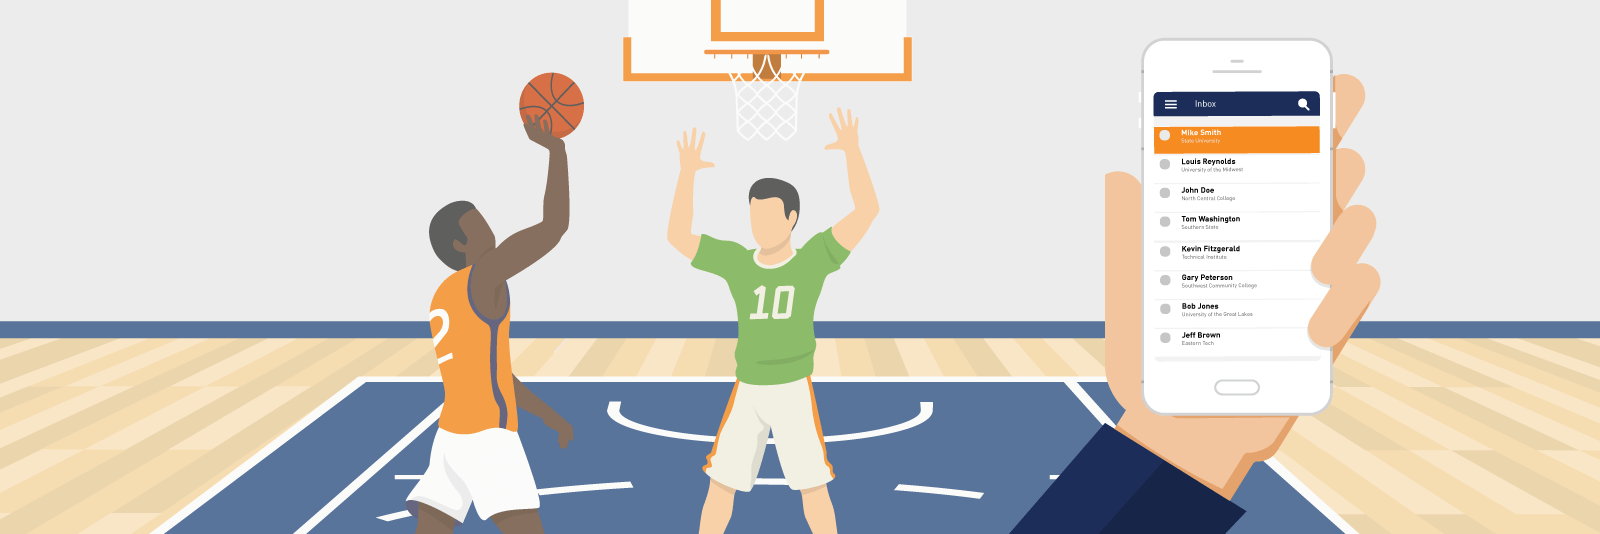 Basketball Recruiting Rules stavki na ncaa basketball